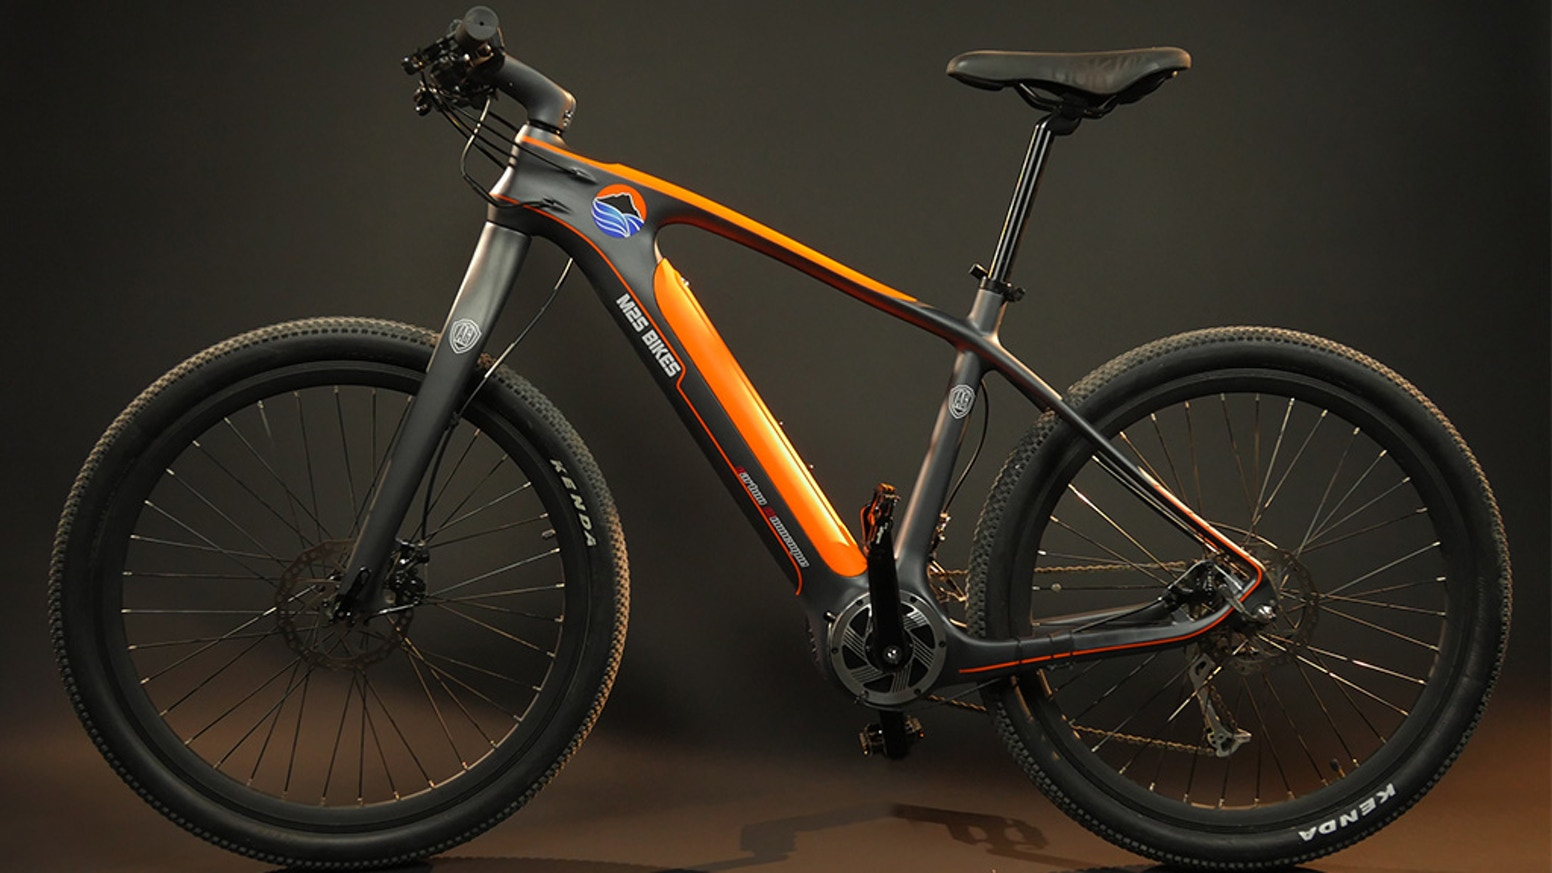 Carbon Fiber Bikes >> The All Go Carbon Fiber Electric Bike By Eric Crews Kickstarter